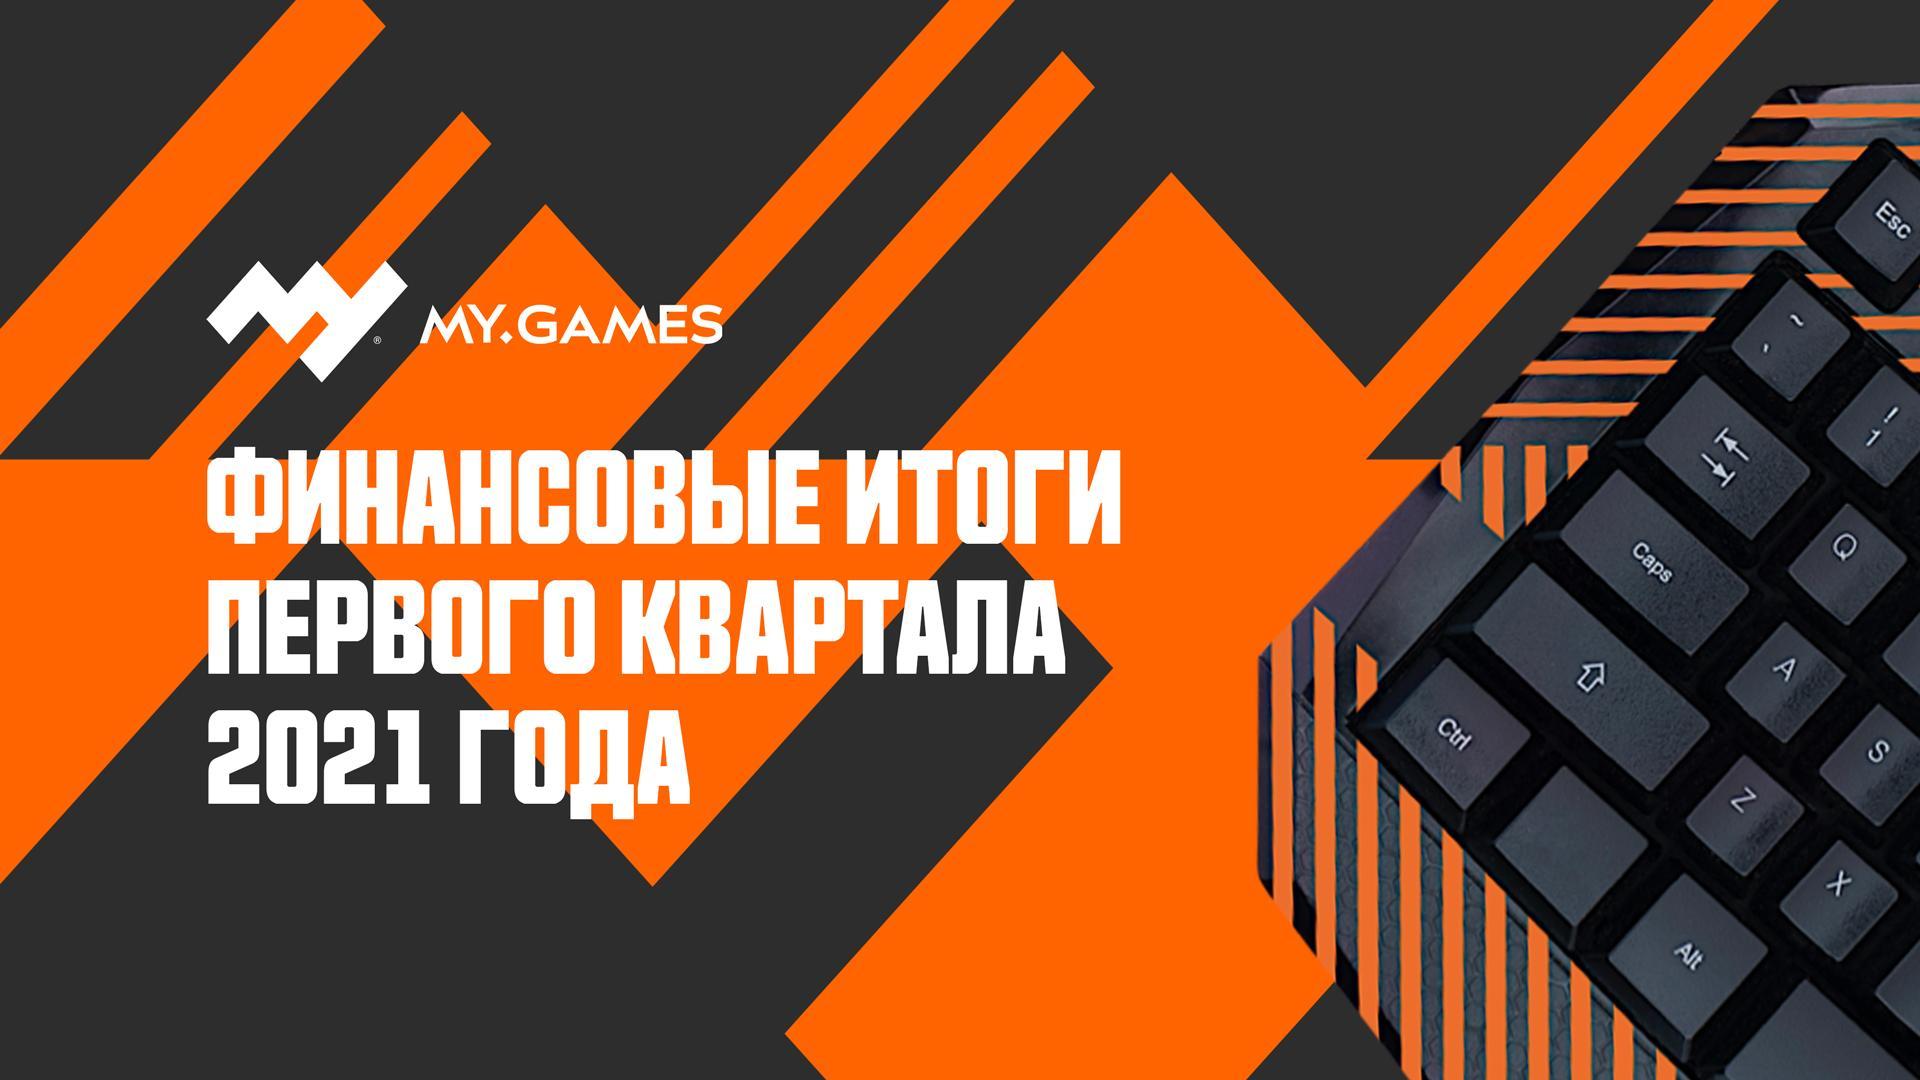 Выручка My.Games за первый квартал 2021 года выросла на 42,2%